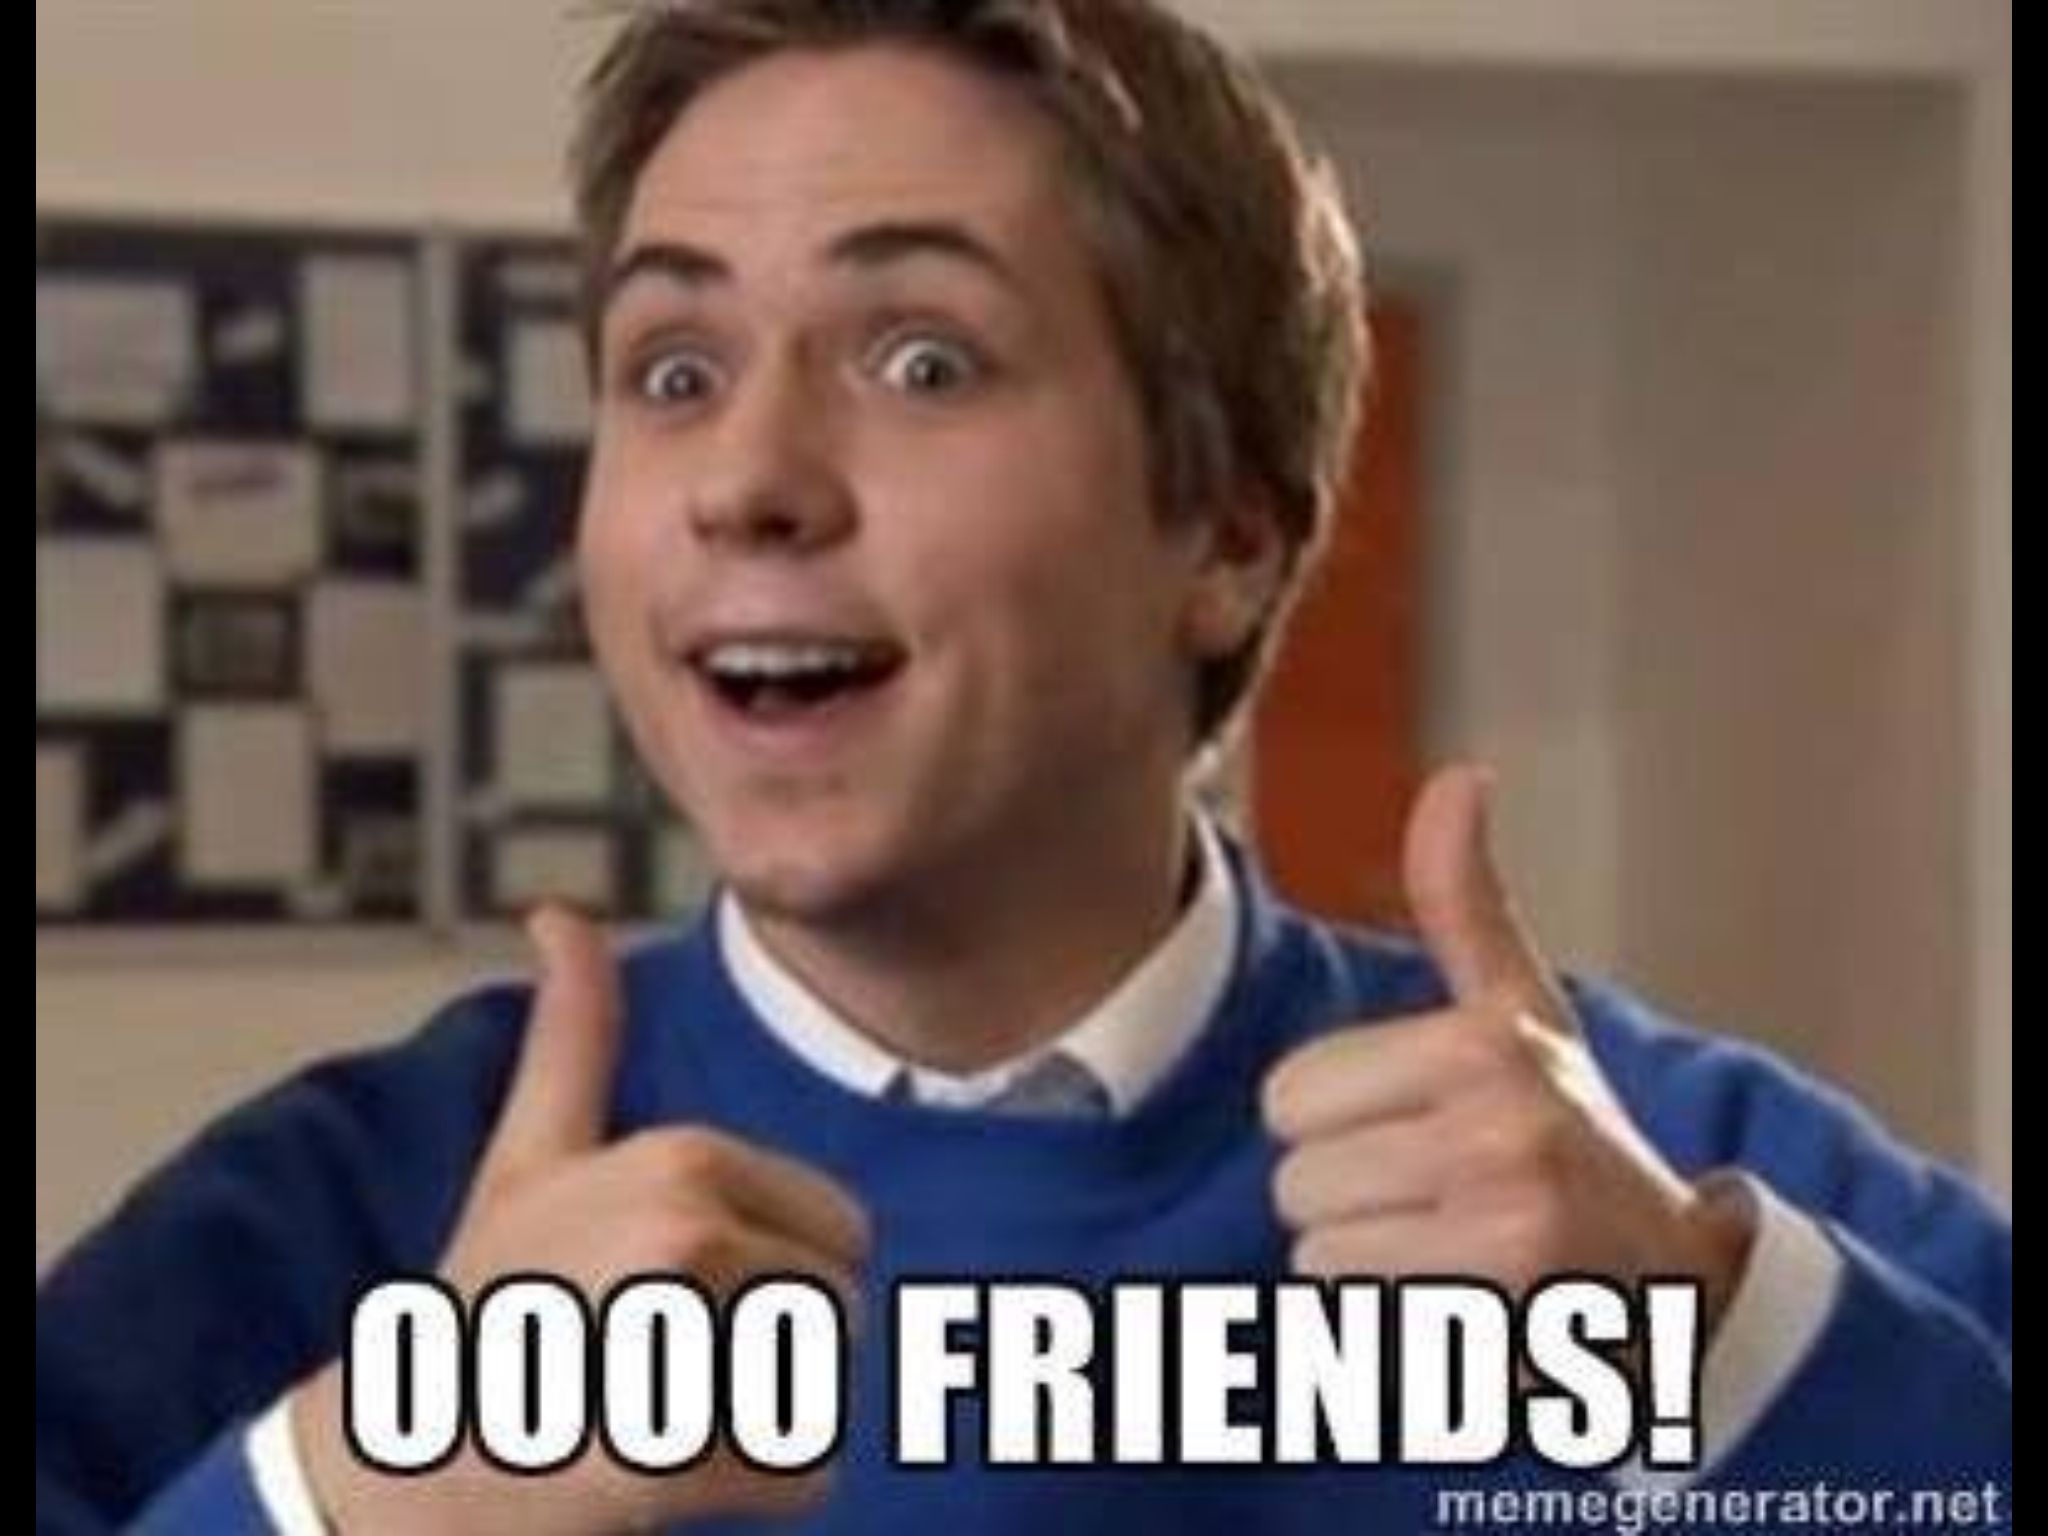 Love This Scene From The Inbitweeners #Friends